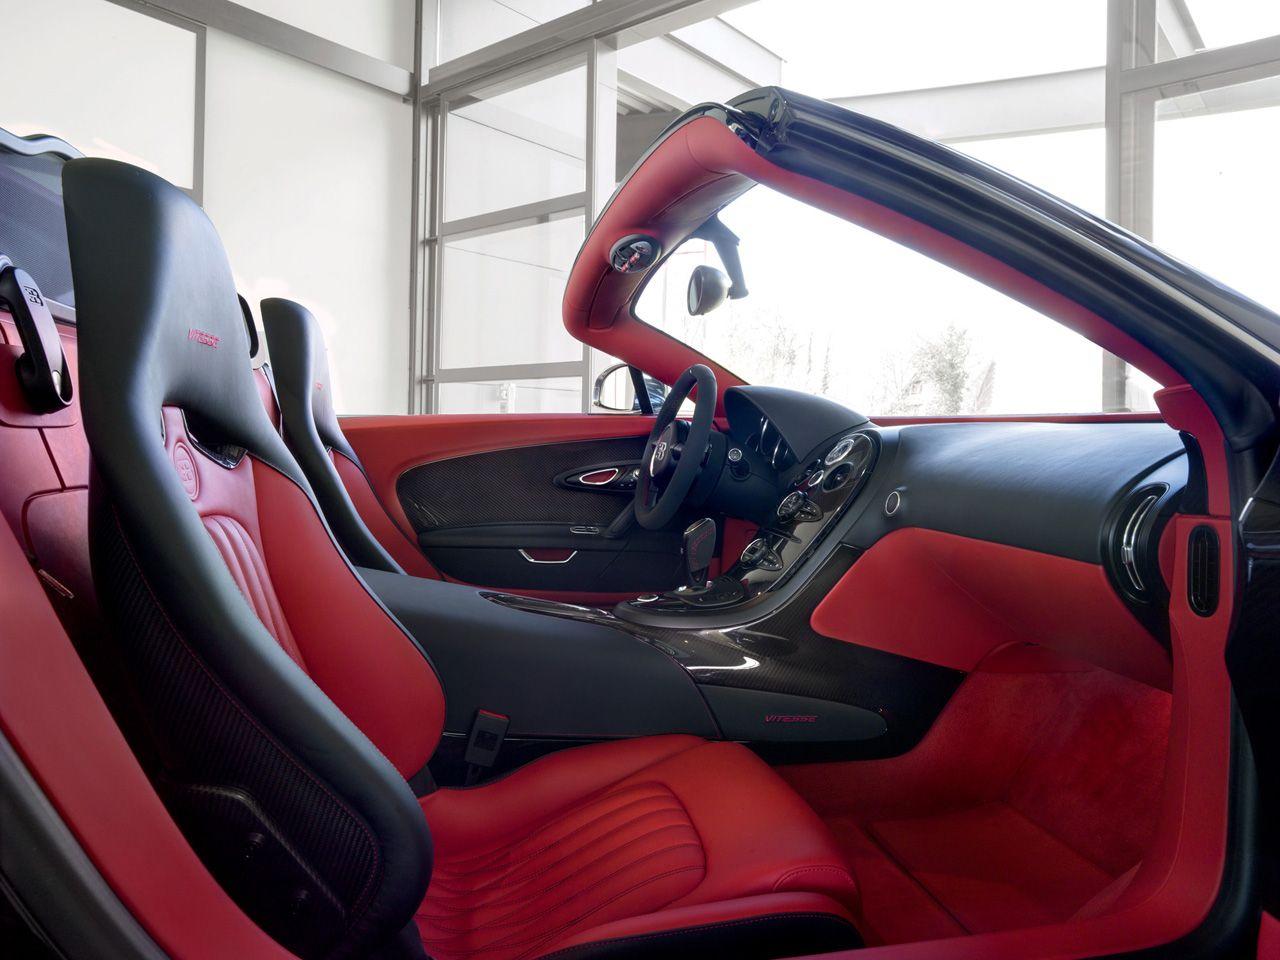 2012 Bugatti Veyron Grand Sport Vitesse Black And Red Bugatti